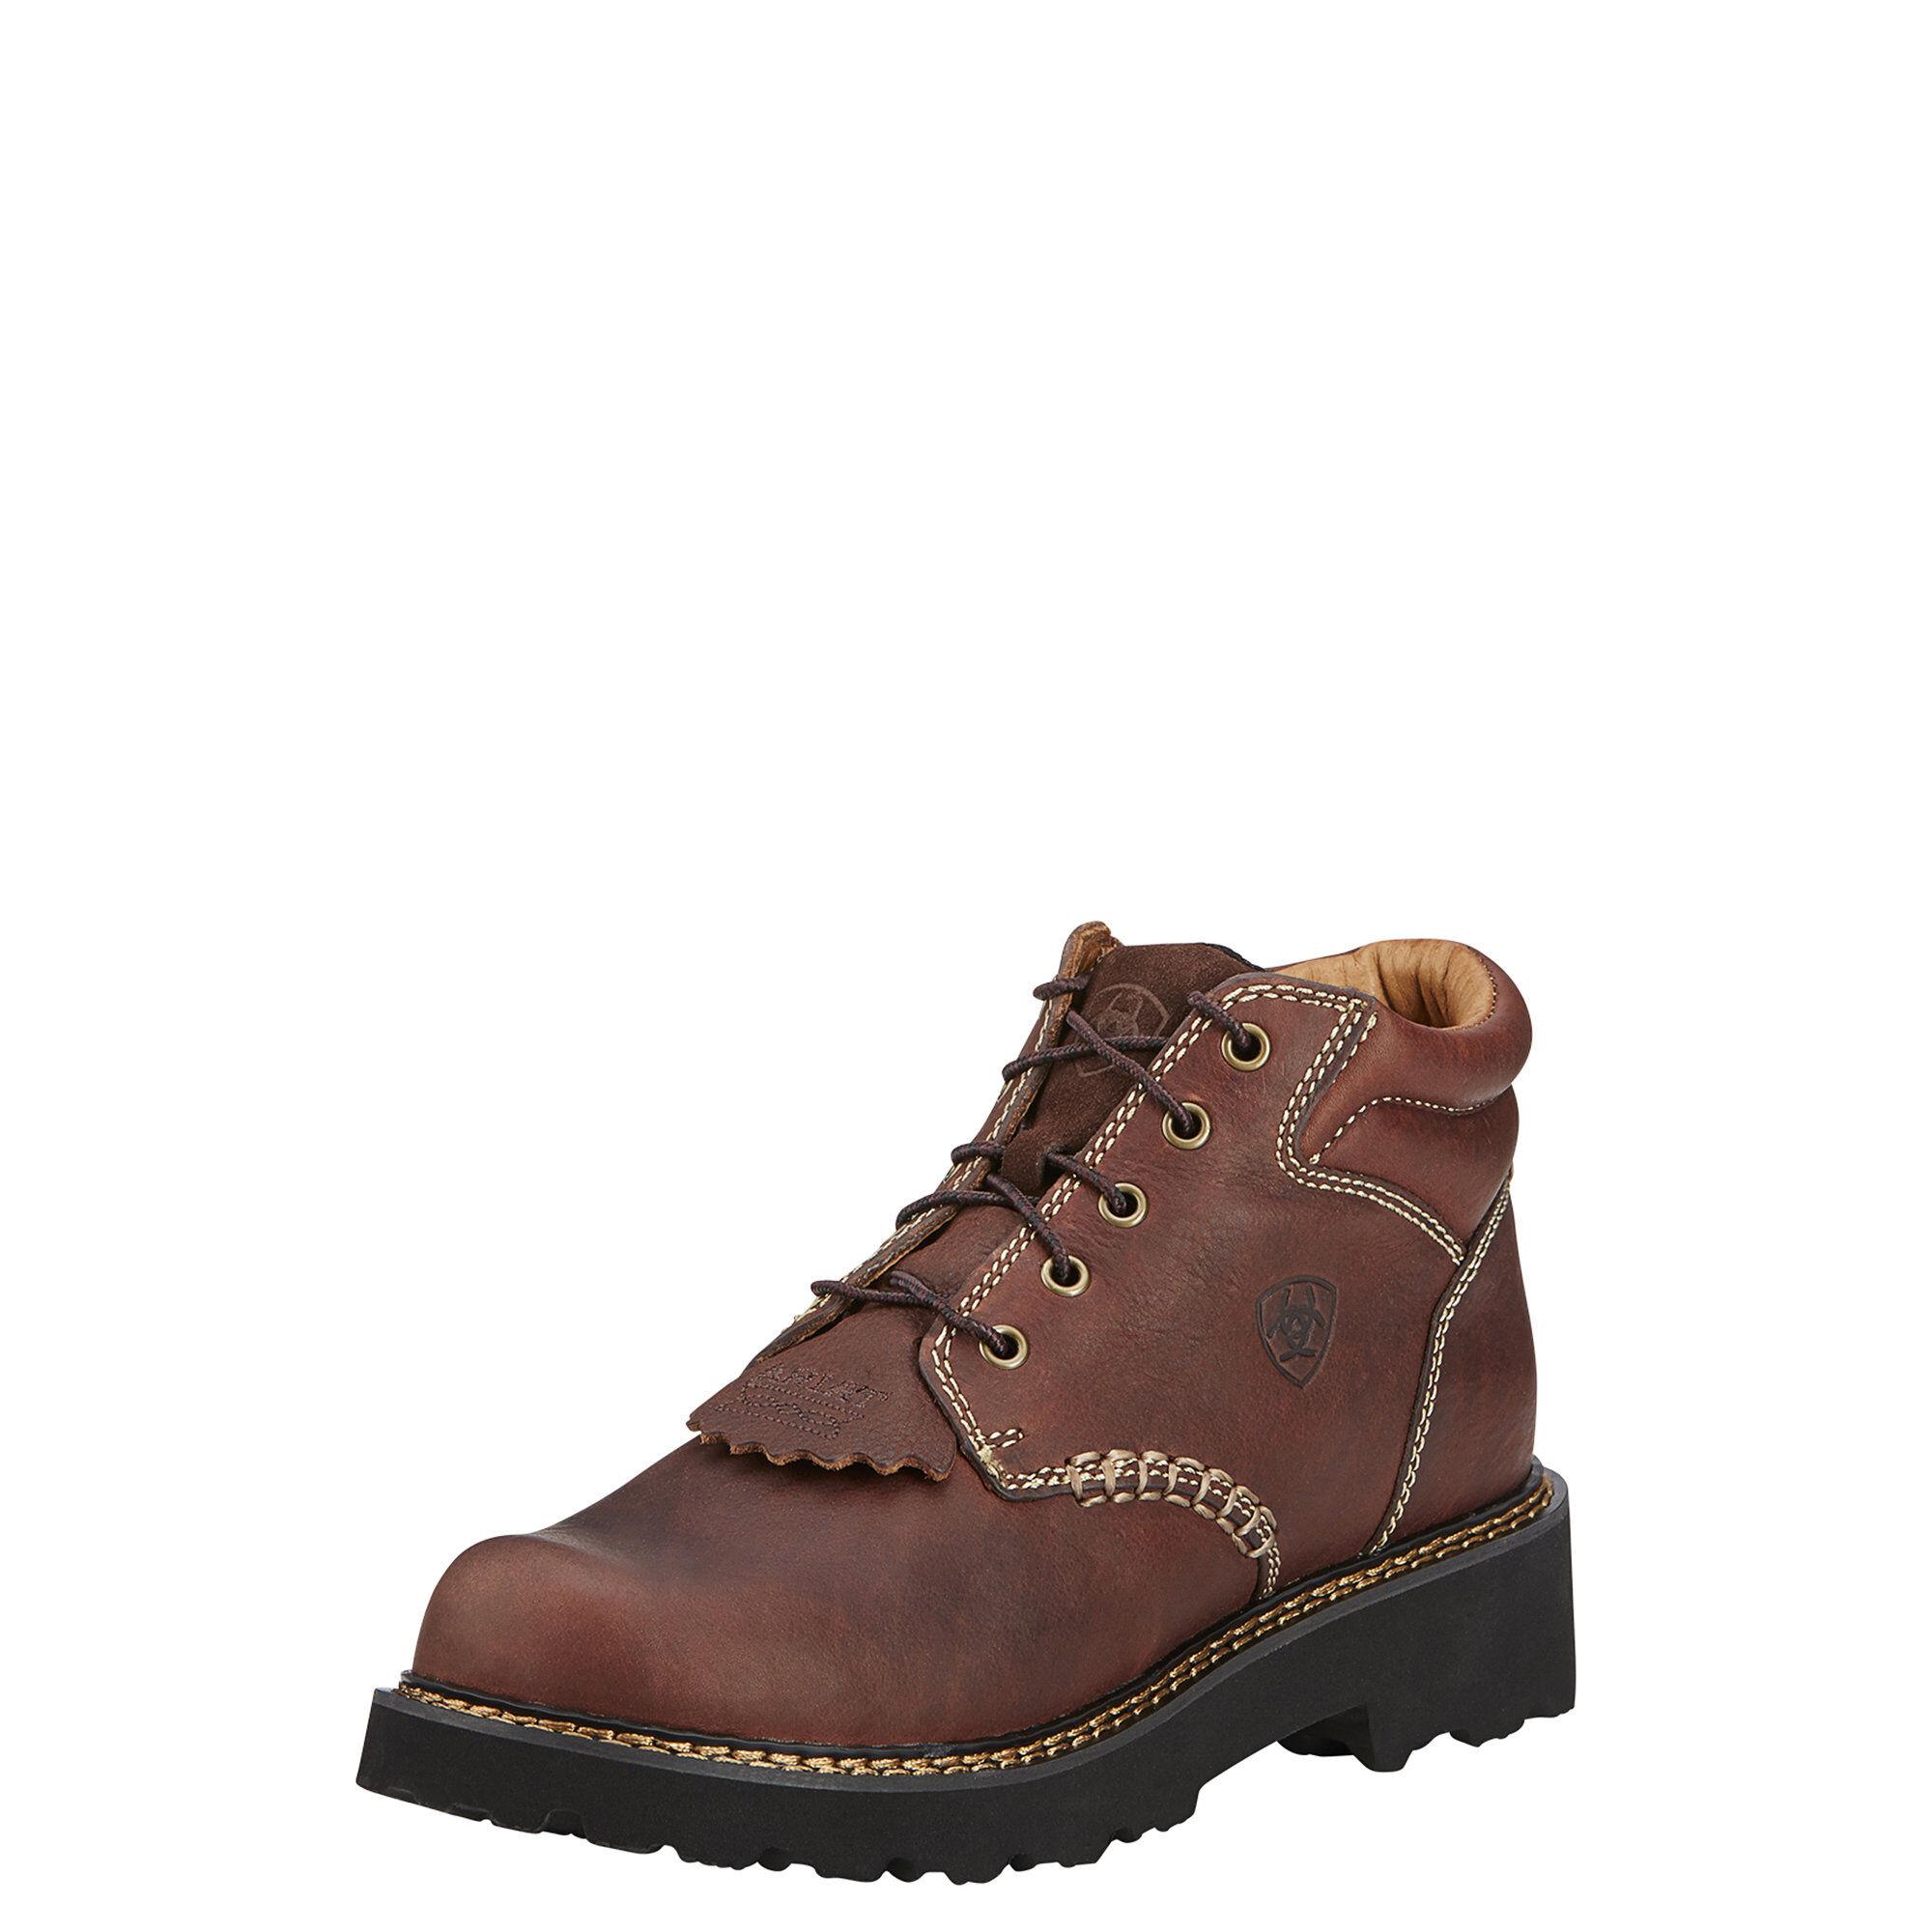 Canyon Boot